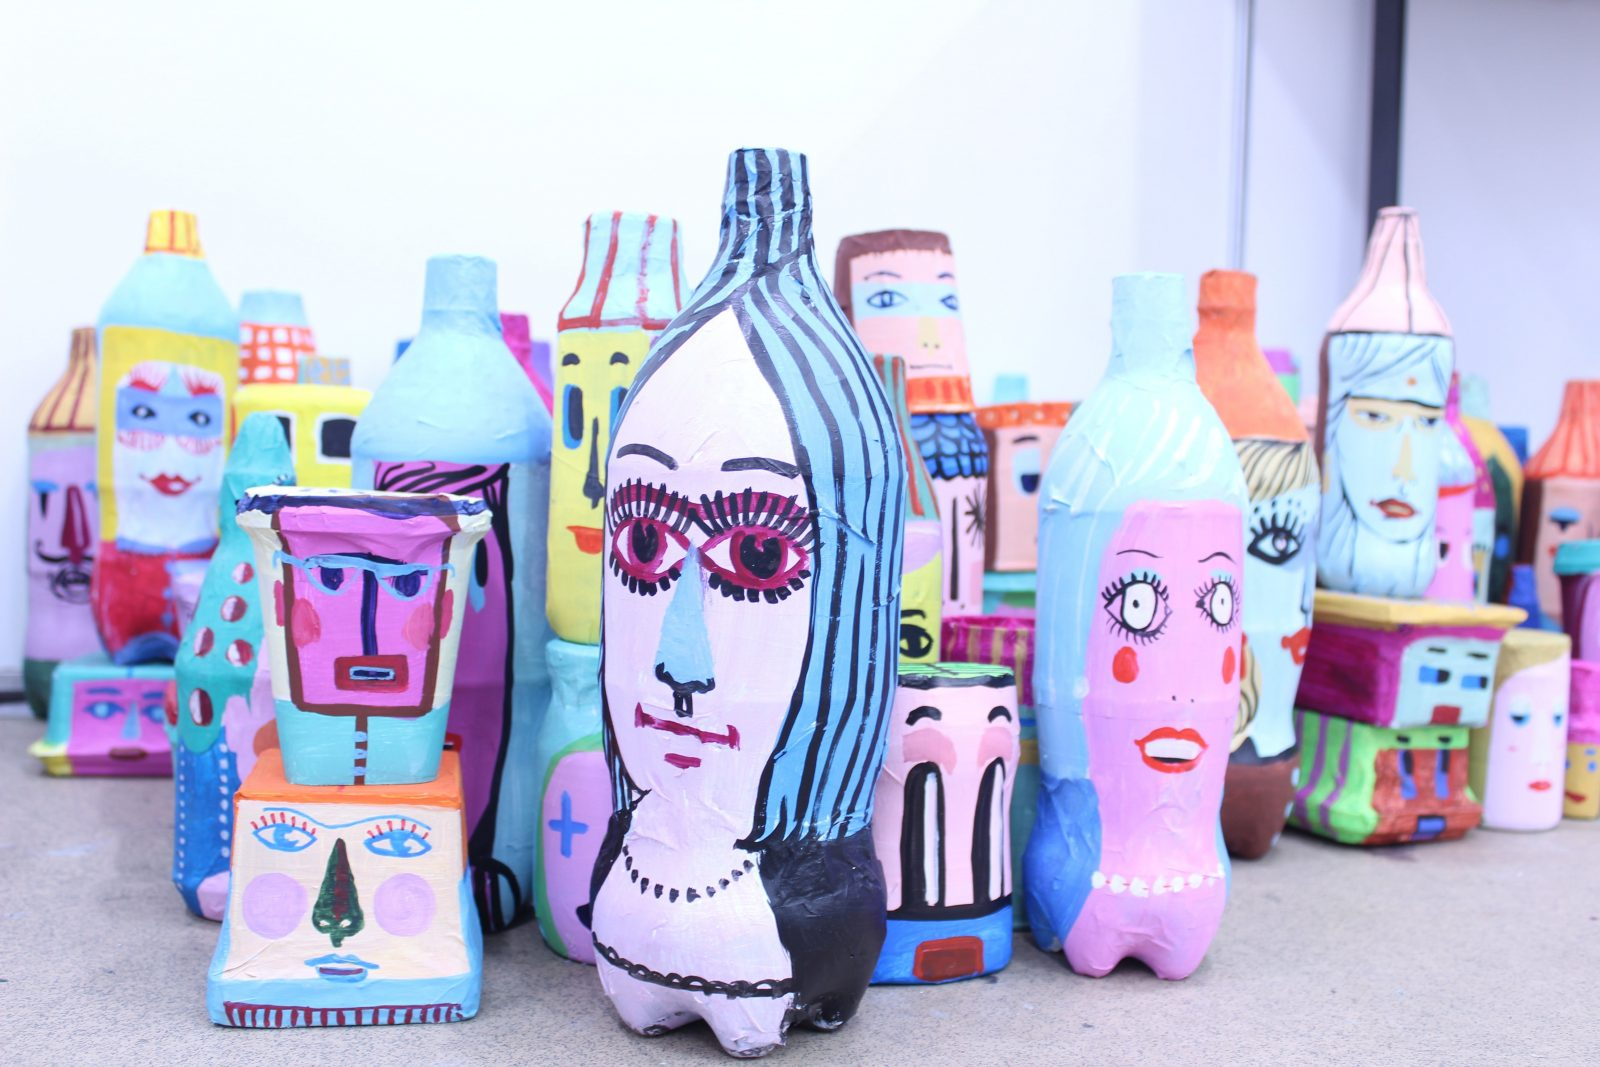 Christina Darras. Bottle People. Crafts Victoria - August Festival 2019.